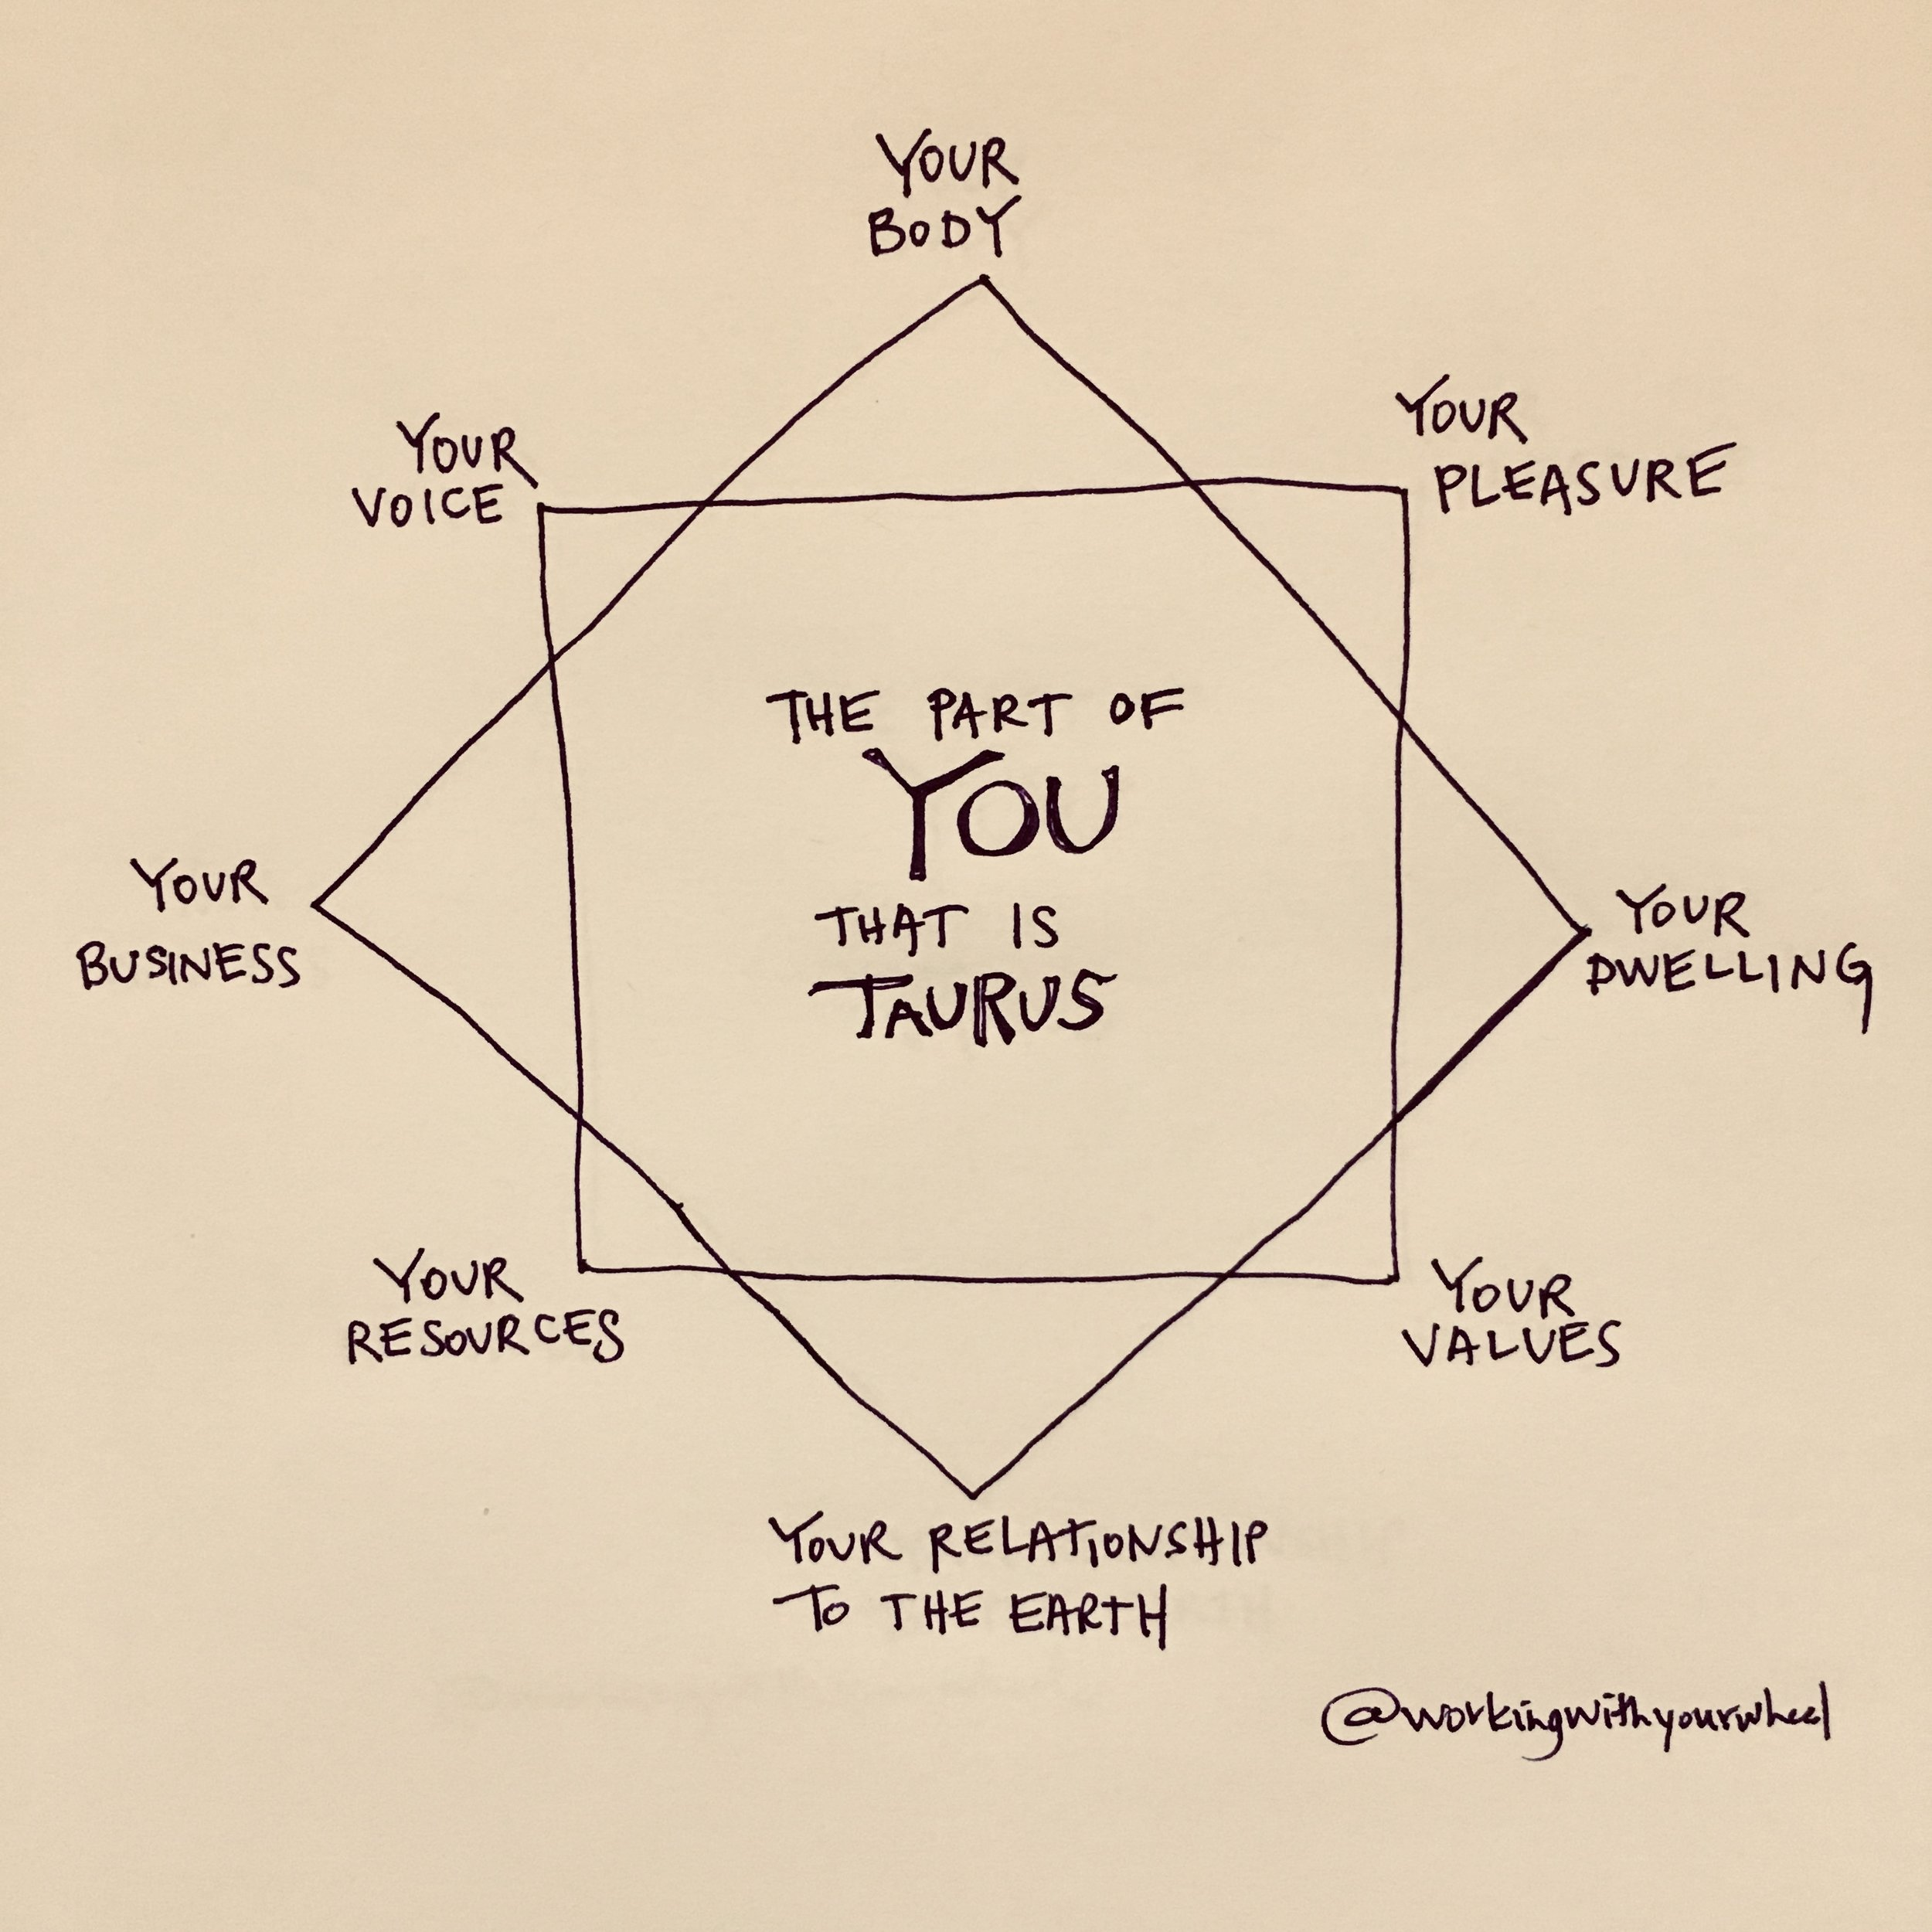 Taurus Star Diagram, designed by me.